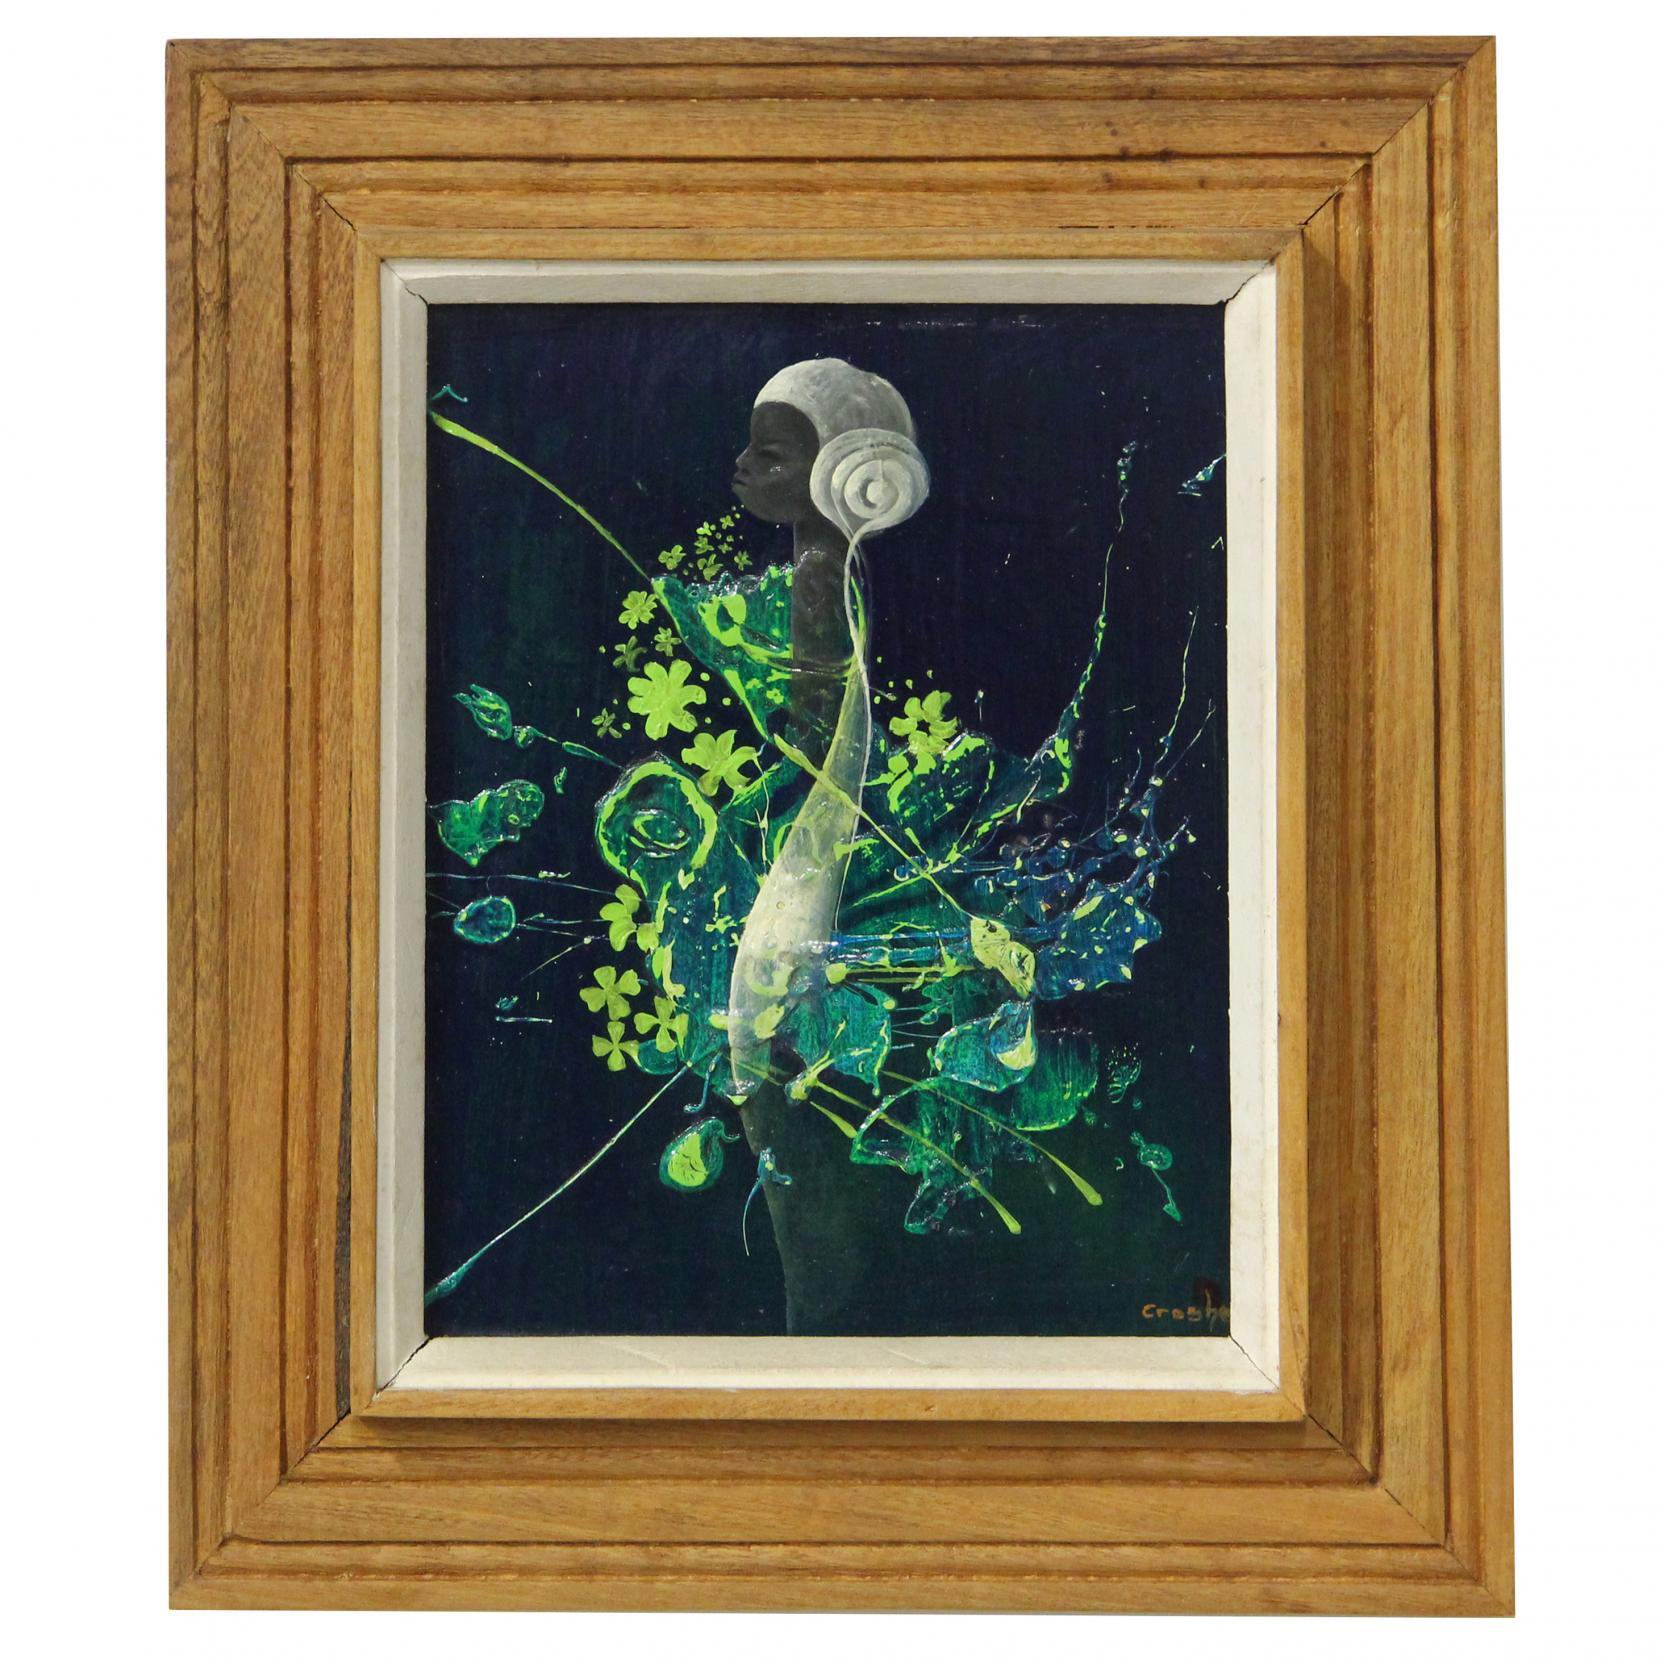 crossley-rupert-enrique-croshen-haitian-b-1950-surrealist-still-life